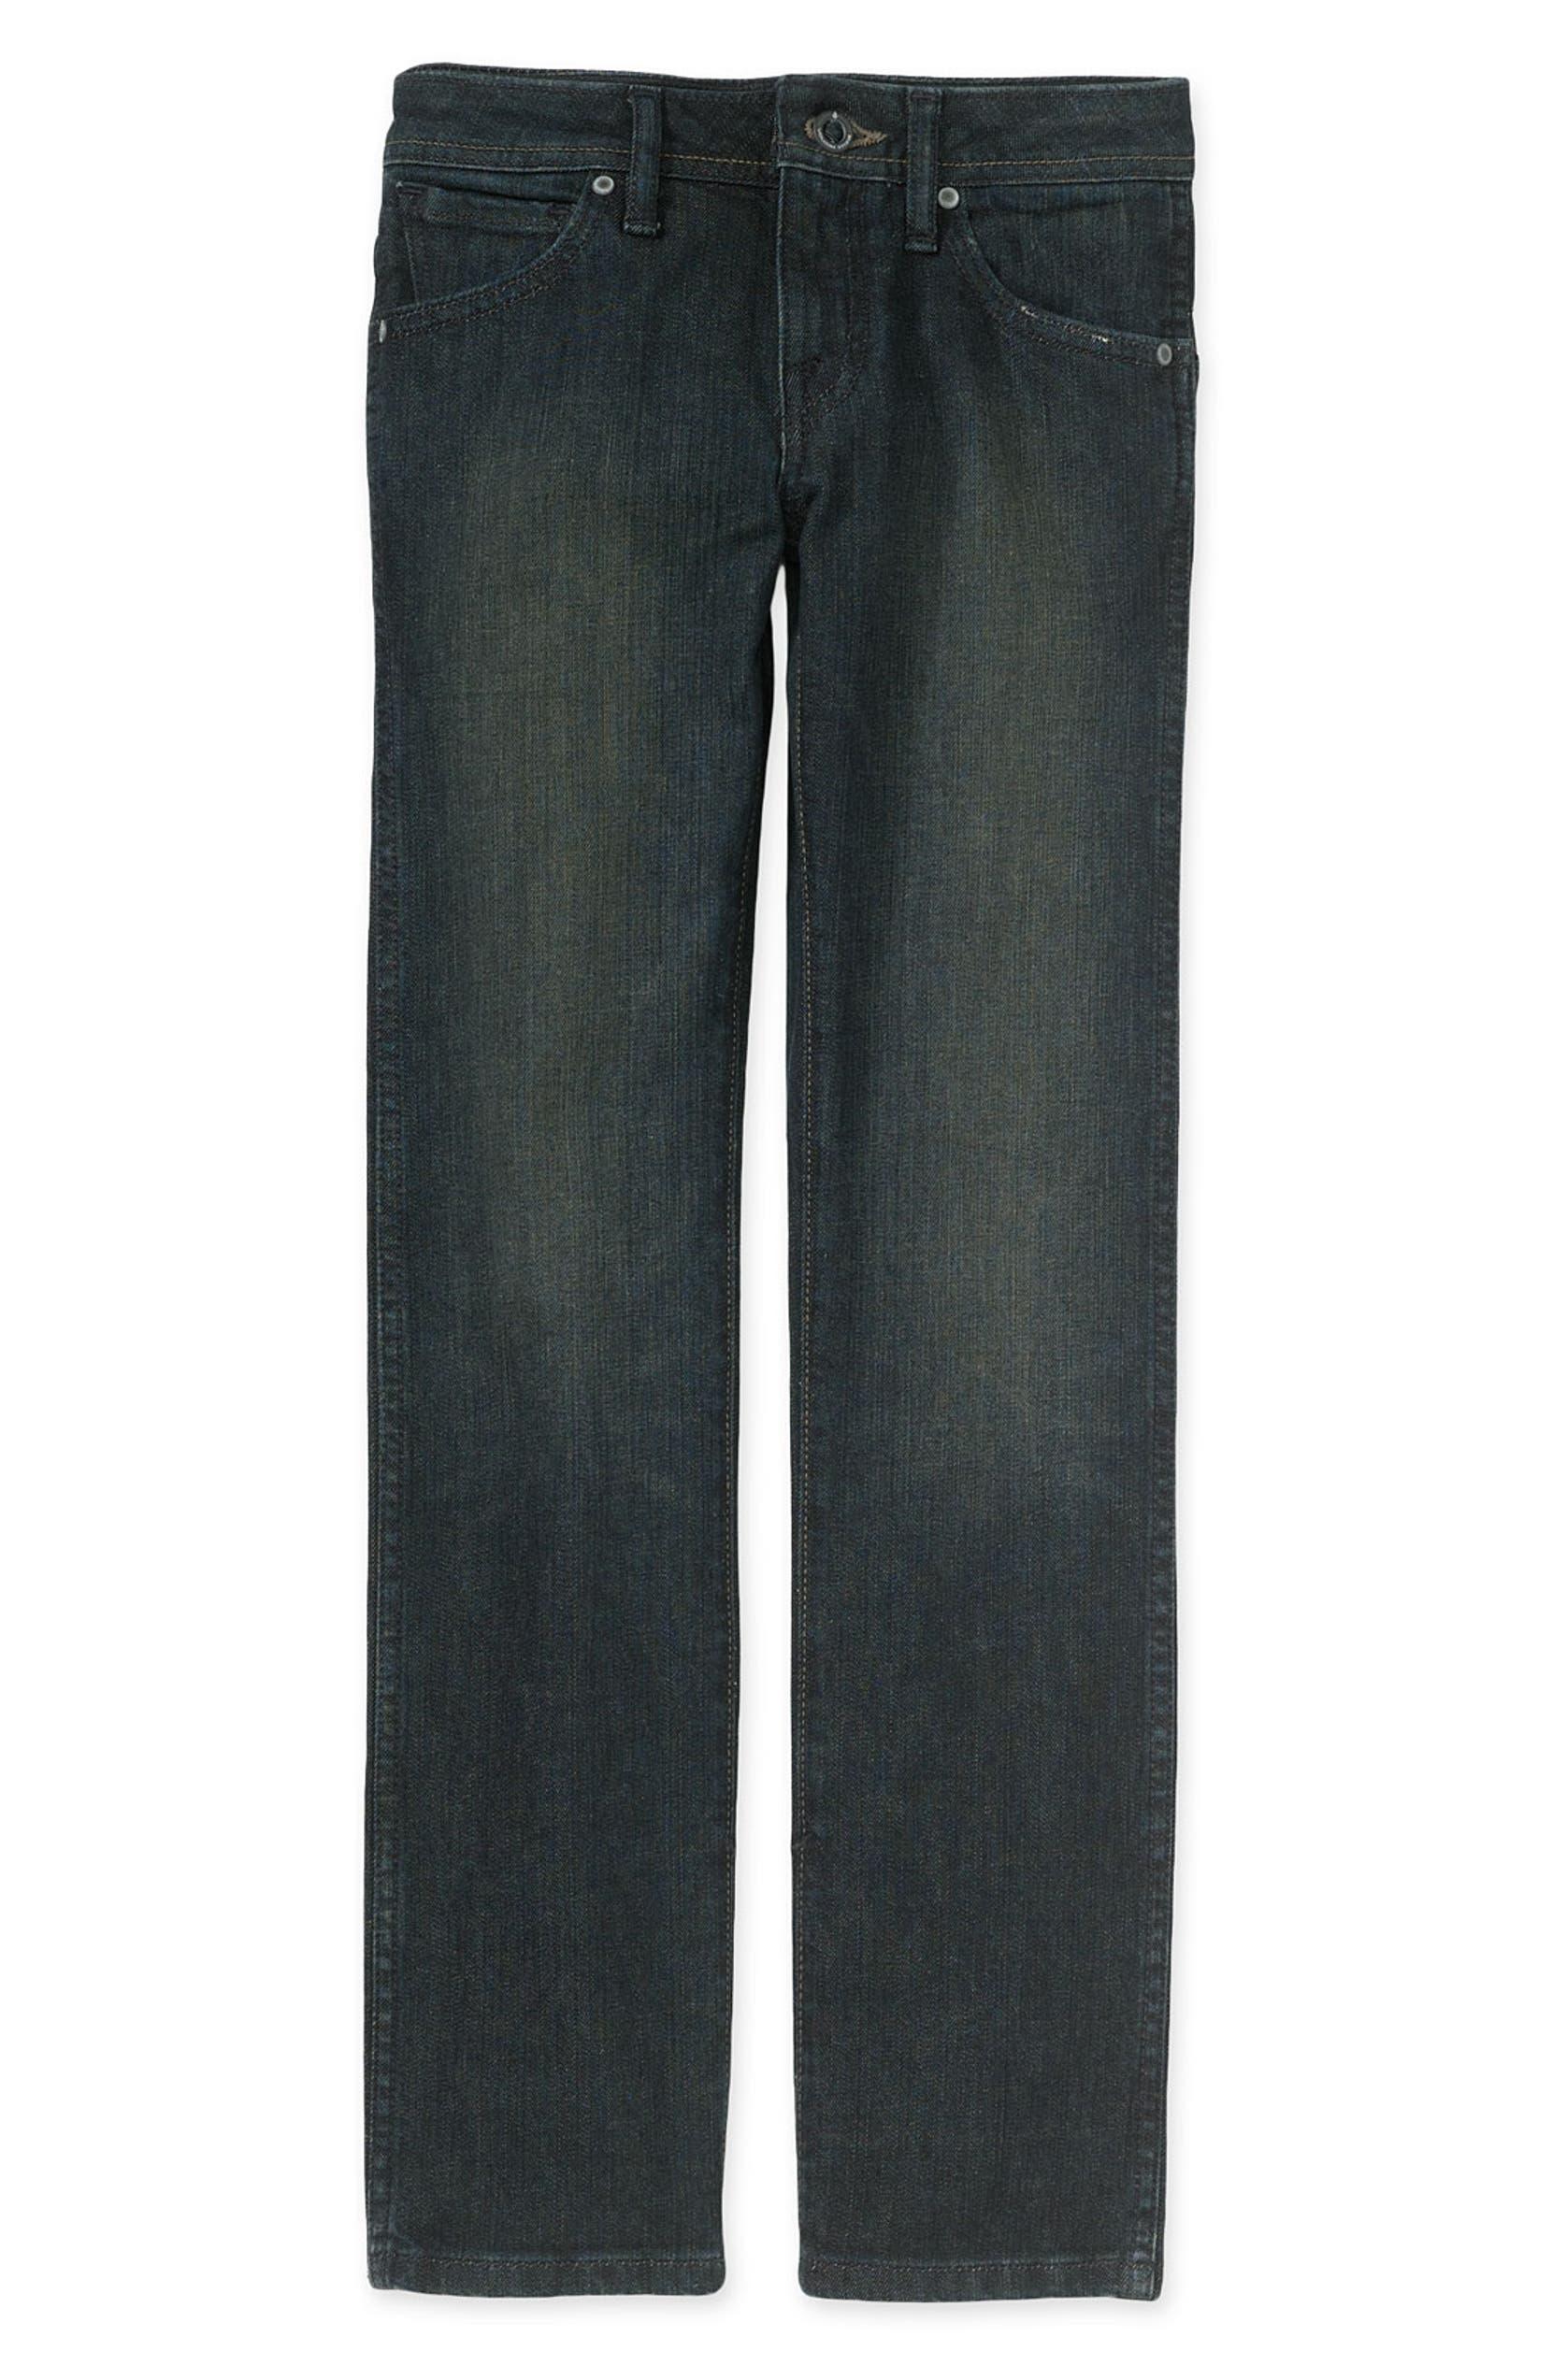 d42a30bf62a586 Volcom '2 x 4' Skinny Jeans (Big Boys)   Nordstrom